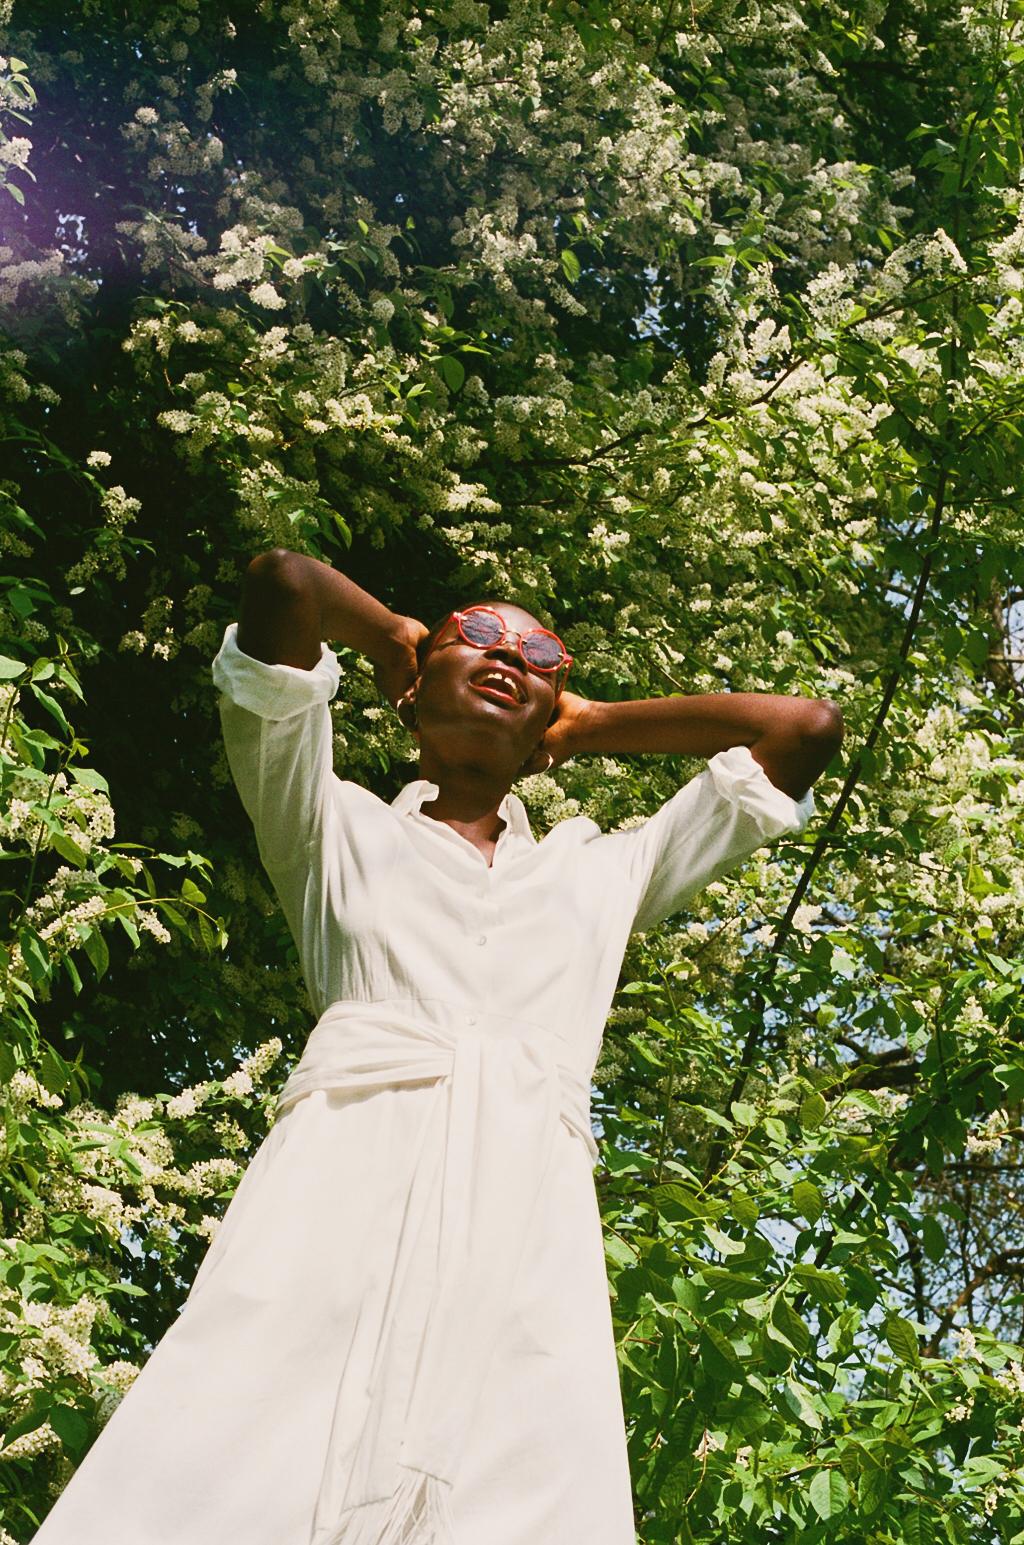 Earrings -Model's own  Sunglasses - Kaleos Eyehunters  Dress - Hillier Bartley